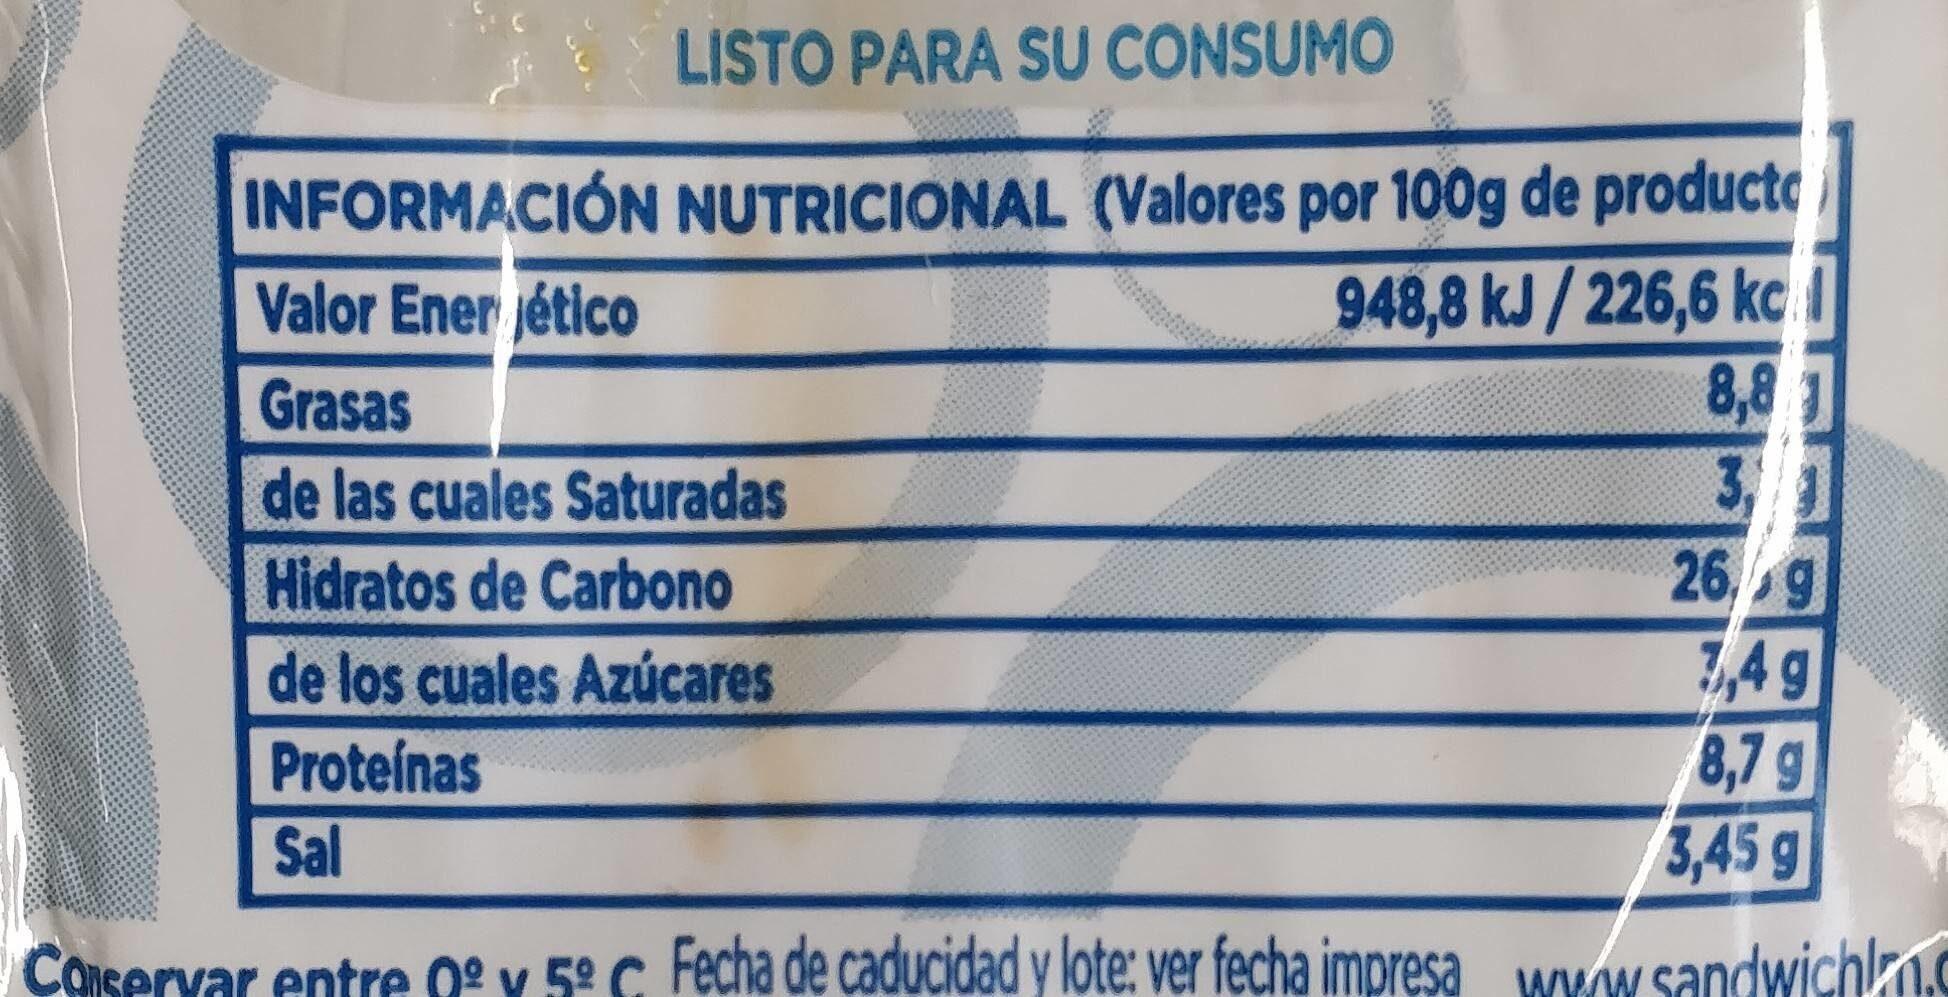 Sandwich nórdico - Información nutricional